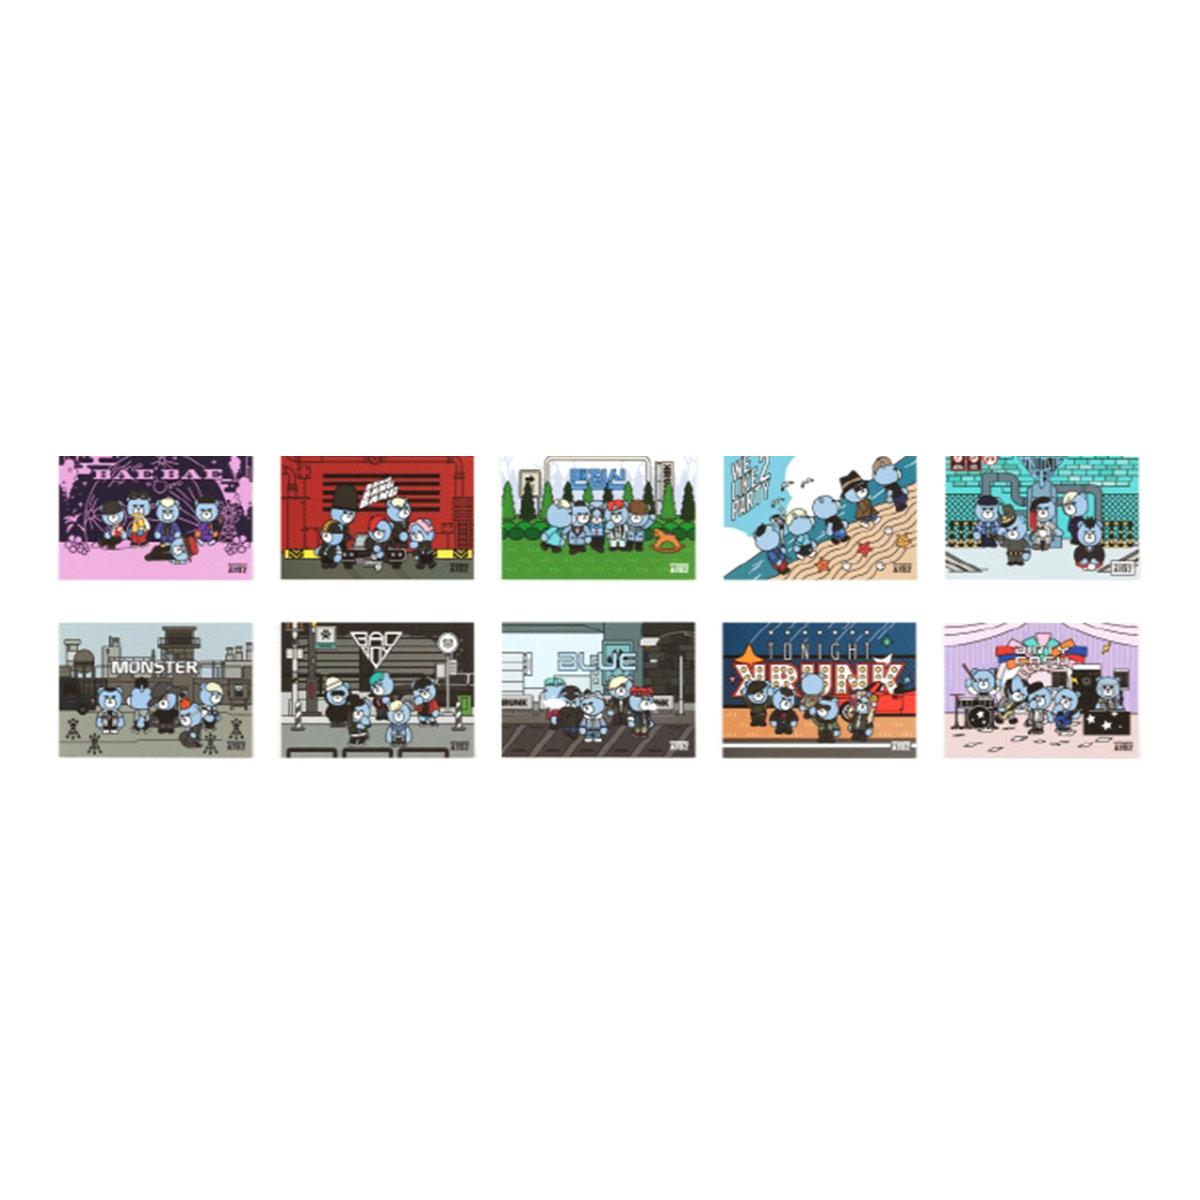 (PRE-ORDER)[10th] KRUNK X BIGBANG POSTCARD SET